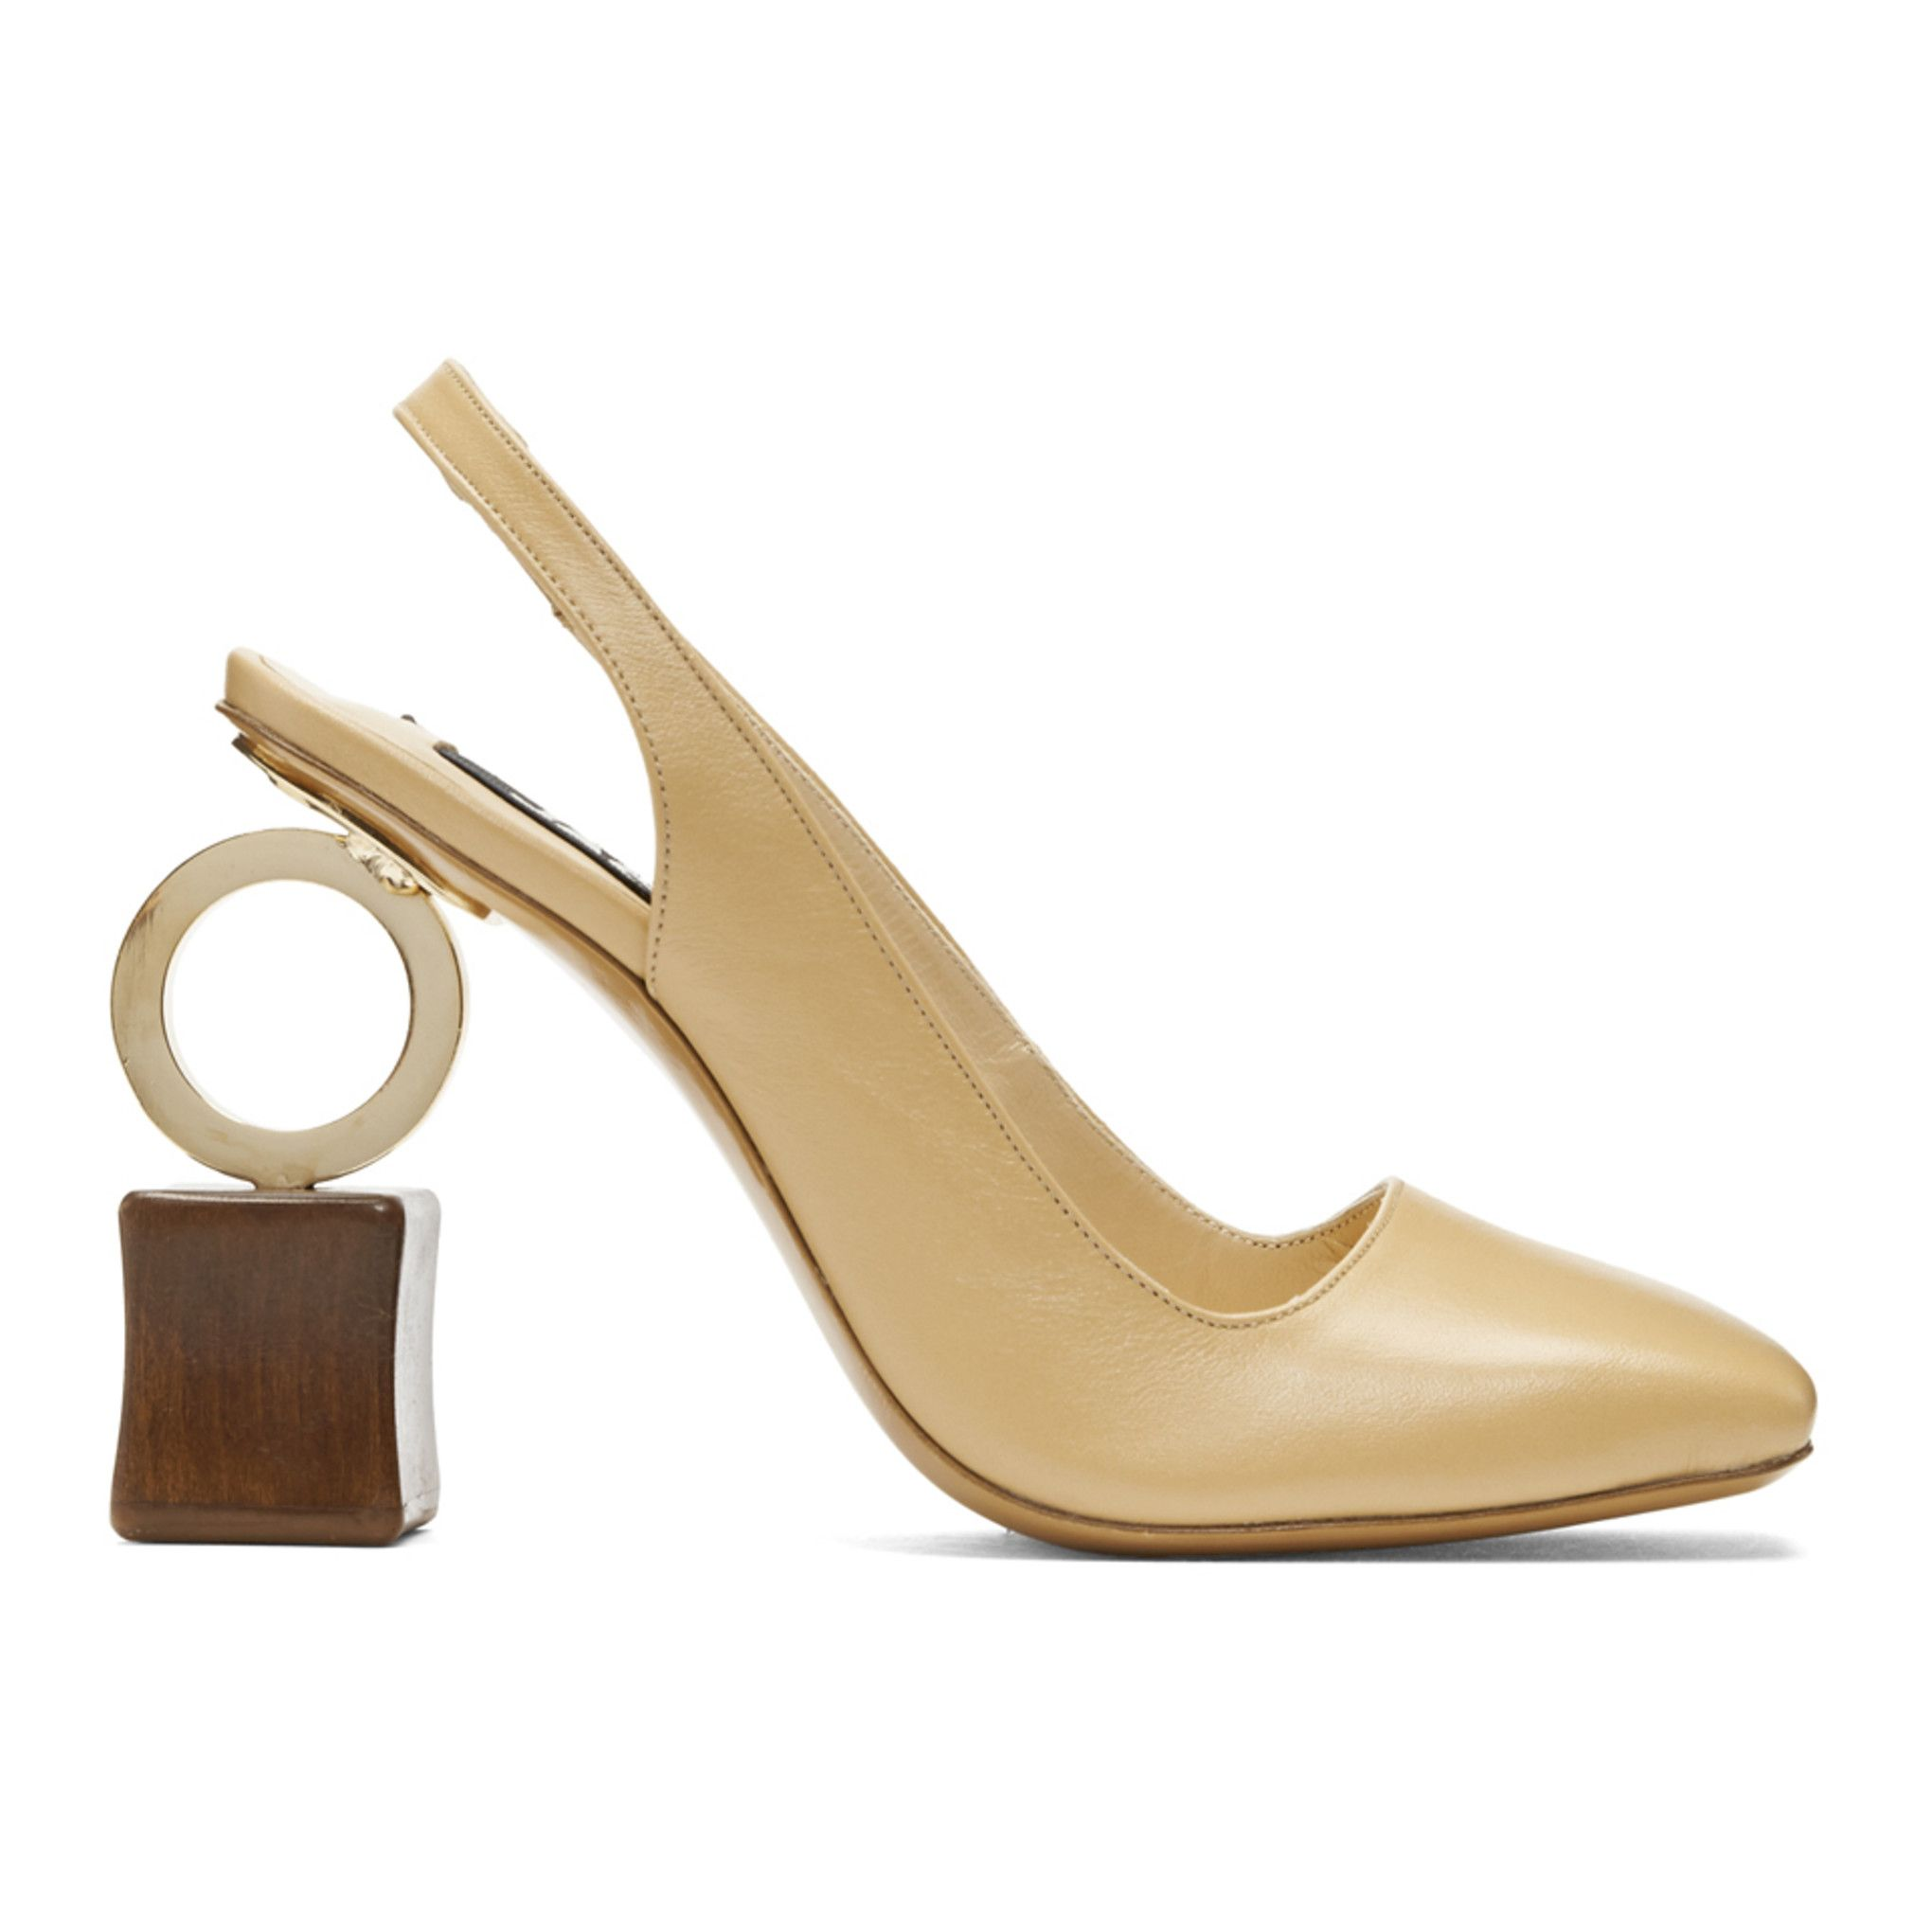 db56ce3afaf Jacquemus - Beige  Les Chaussures Conga  Heels Jacquemus Shoes